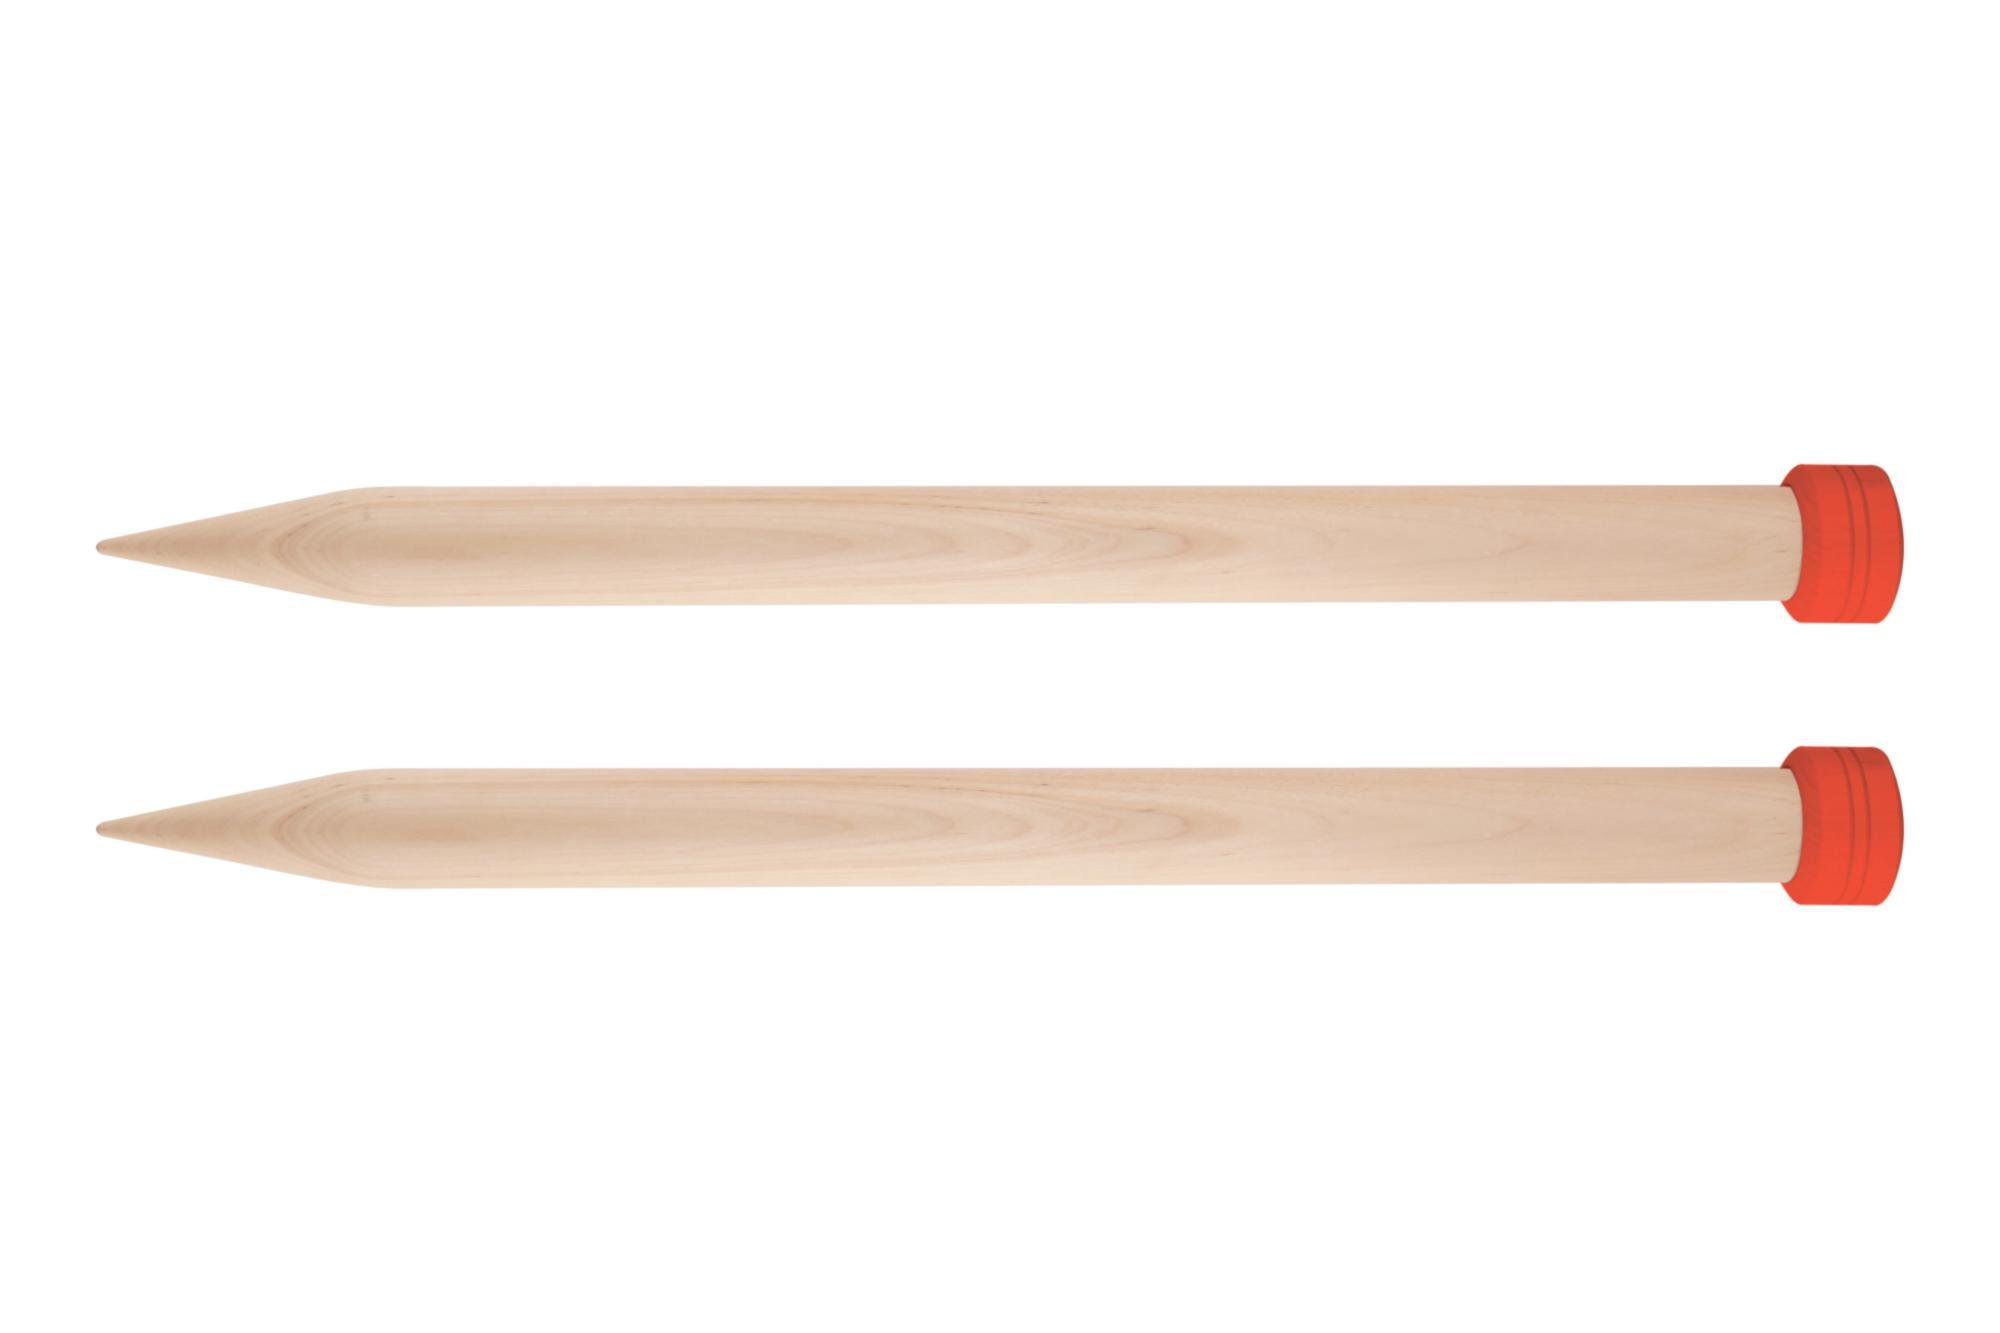 Спицы прямые 30 см Jumbo Birch KnitPro, 35255, 25.00 мм